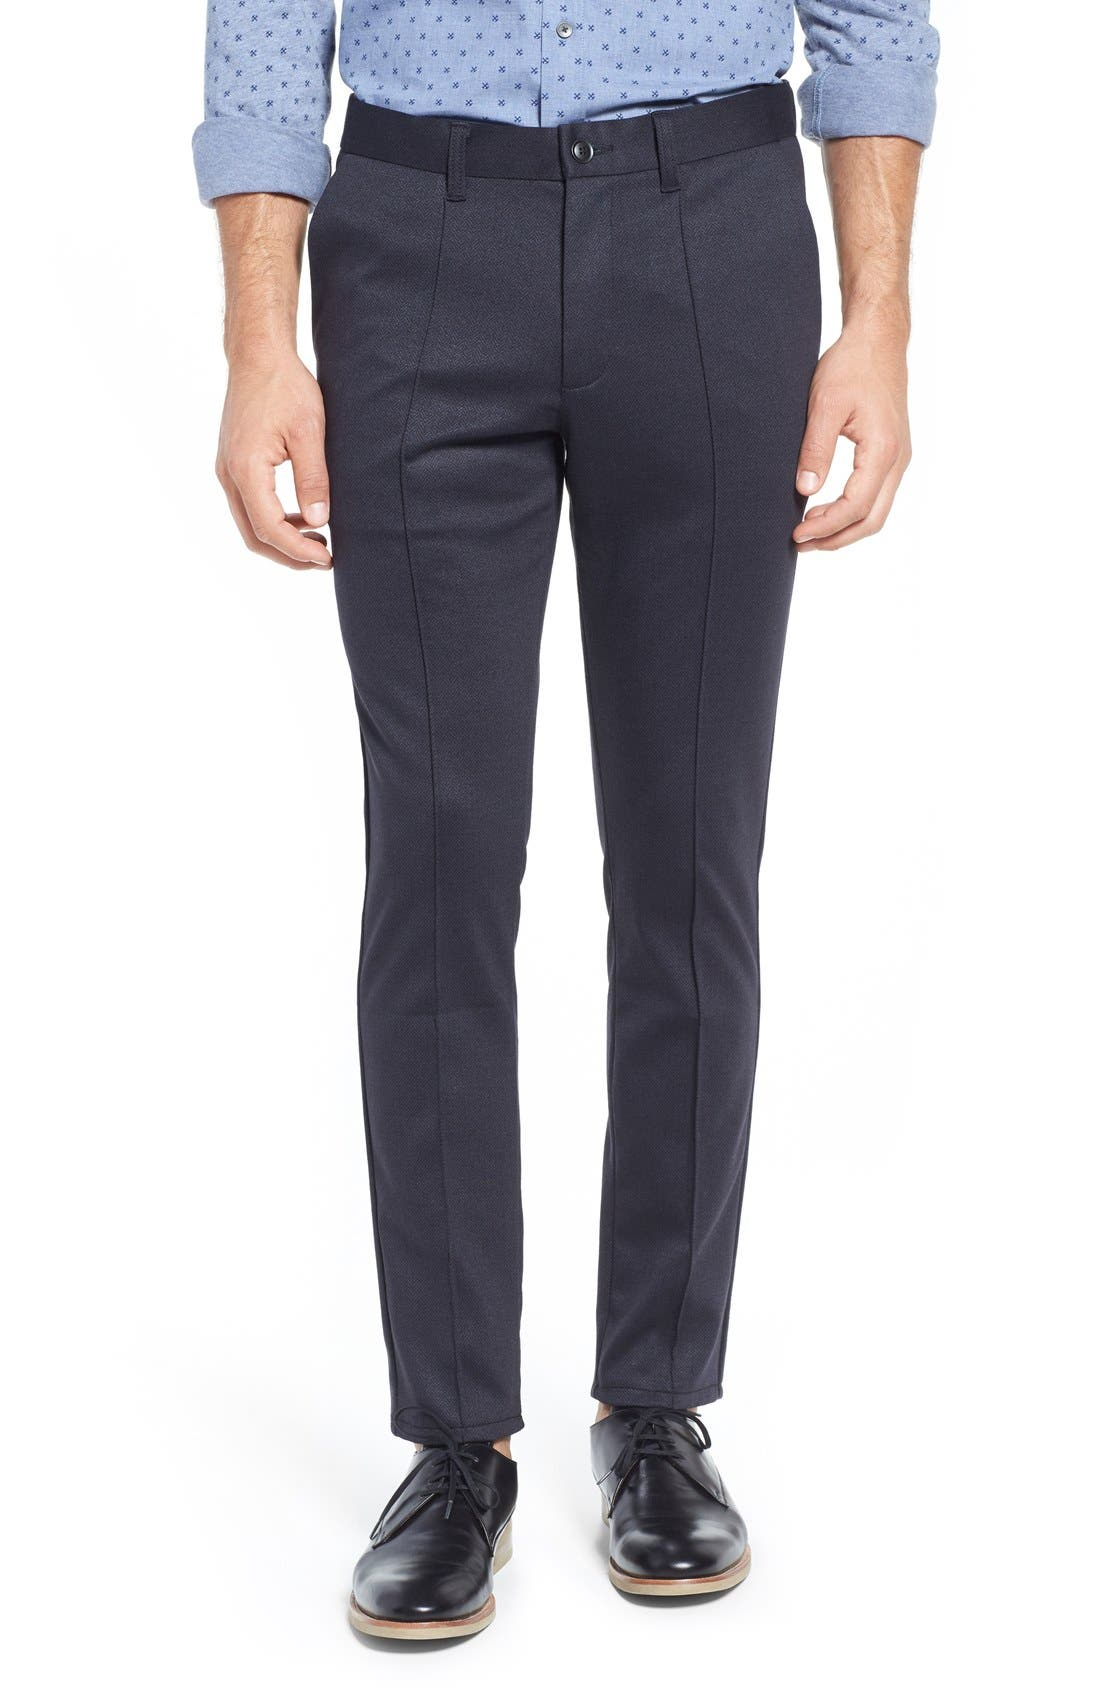 W.R.K Prospect Herringbone Slim Fit Trousers